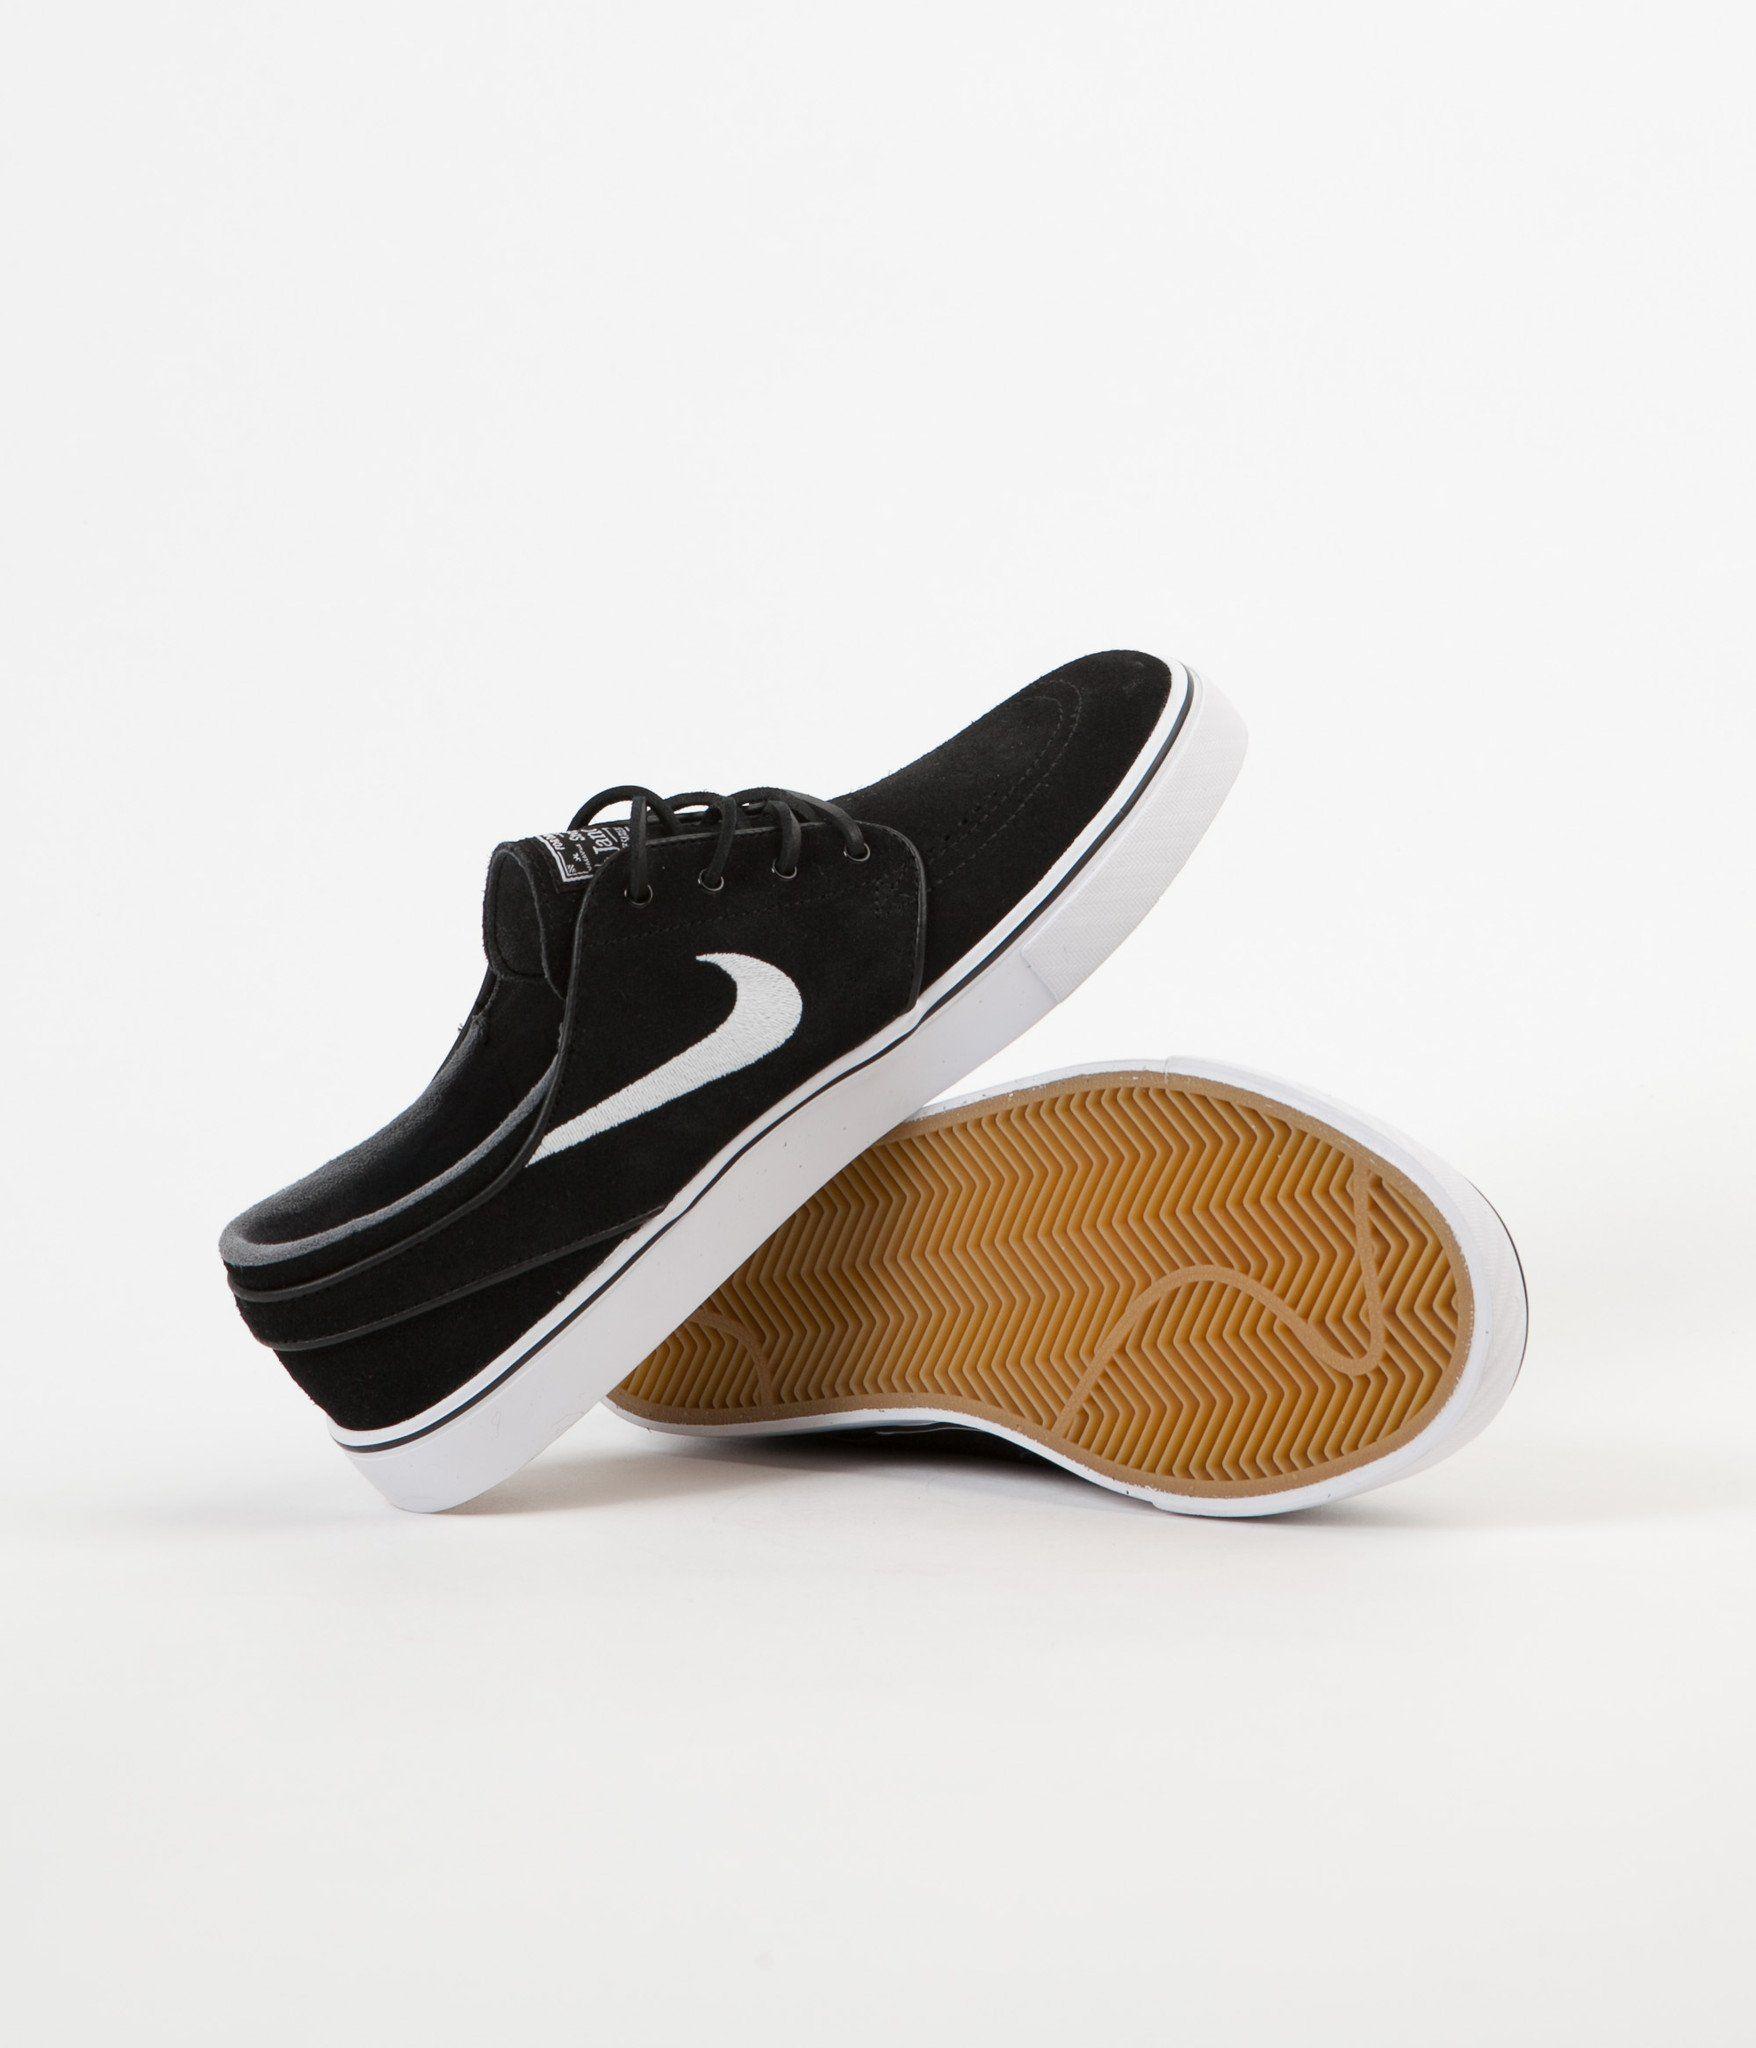 Nike Sb Stefan Janoski Og Shoes Black White Gum Light Brown Black Shoes Nike Sb Stefan Janoski